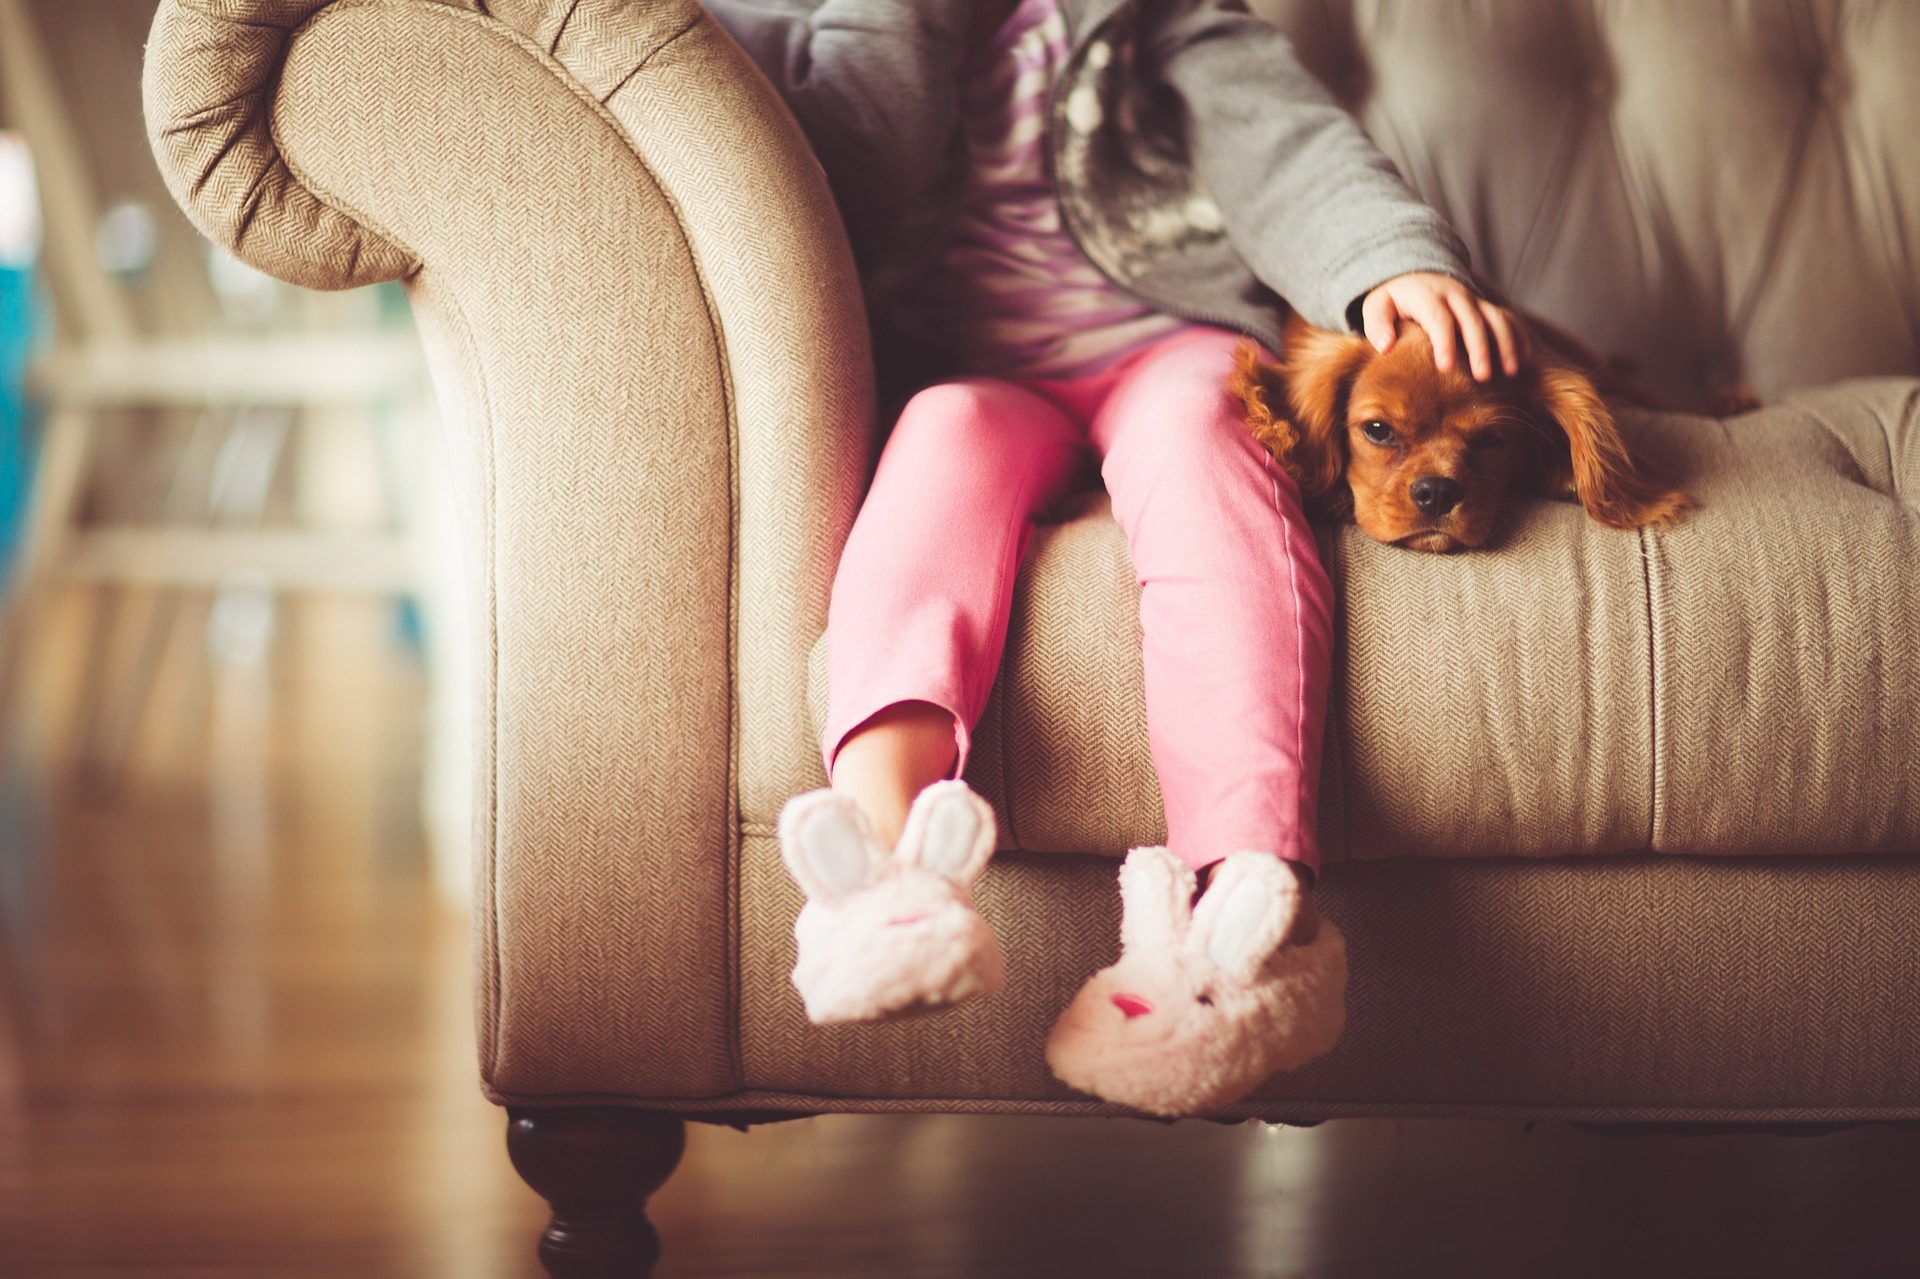 niña, cachorro, mascota, perro, sofá, zapatillas - Fondos de Pantalla HD - professor-falken.com